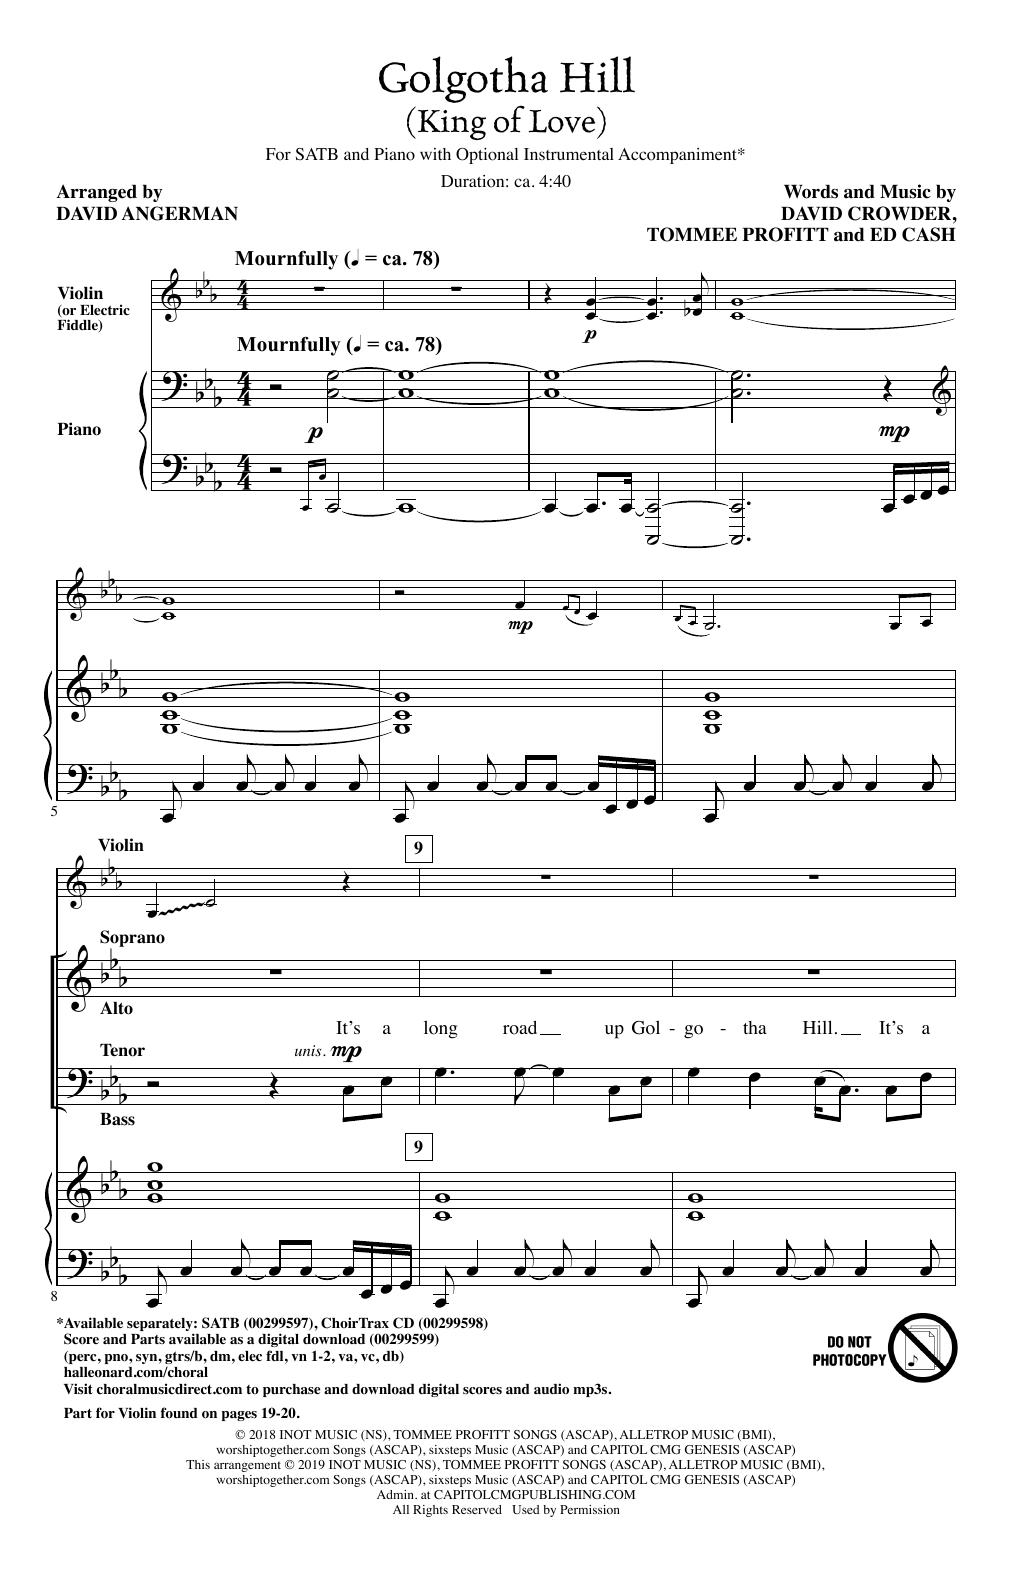 Golgotha Hill (King Of Love) (arr. David Angerman) (SATB Choir)